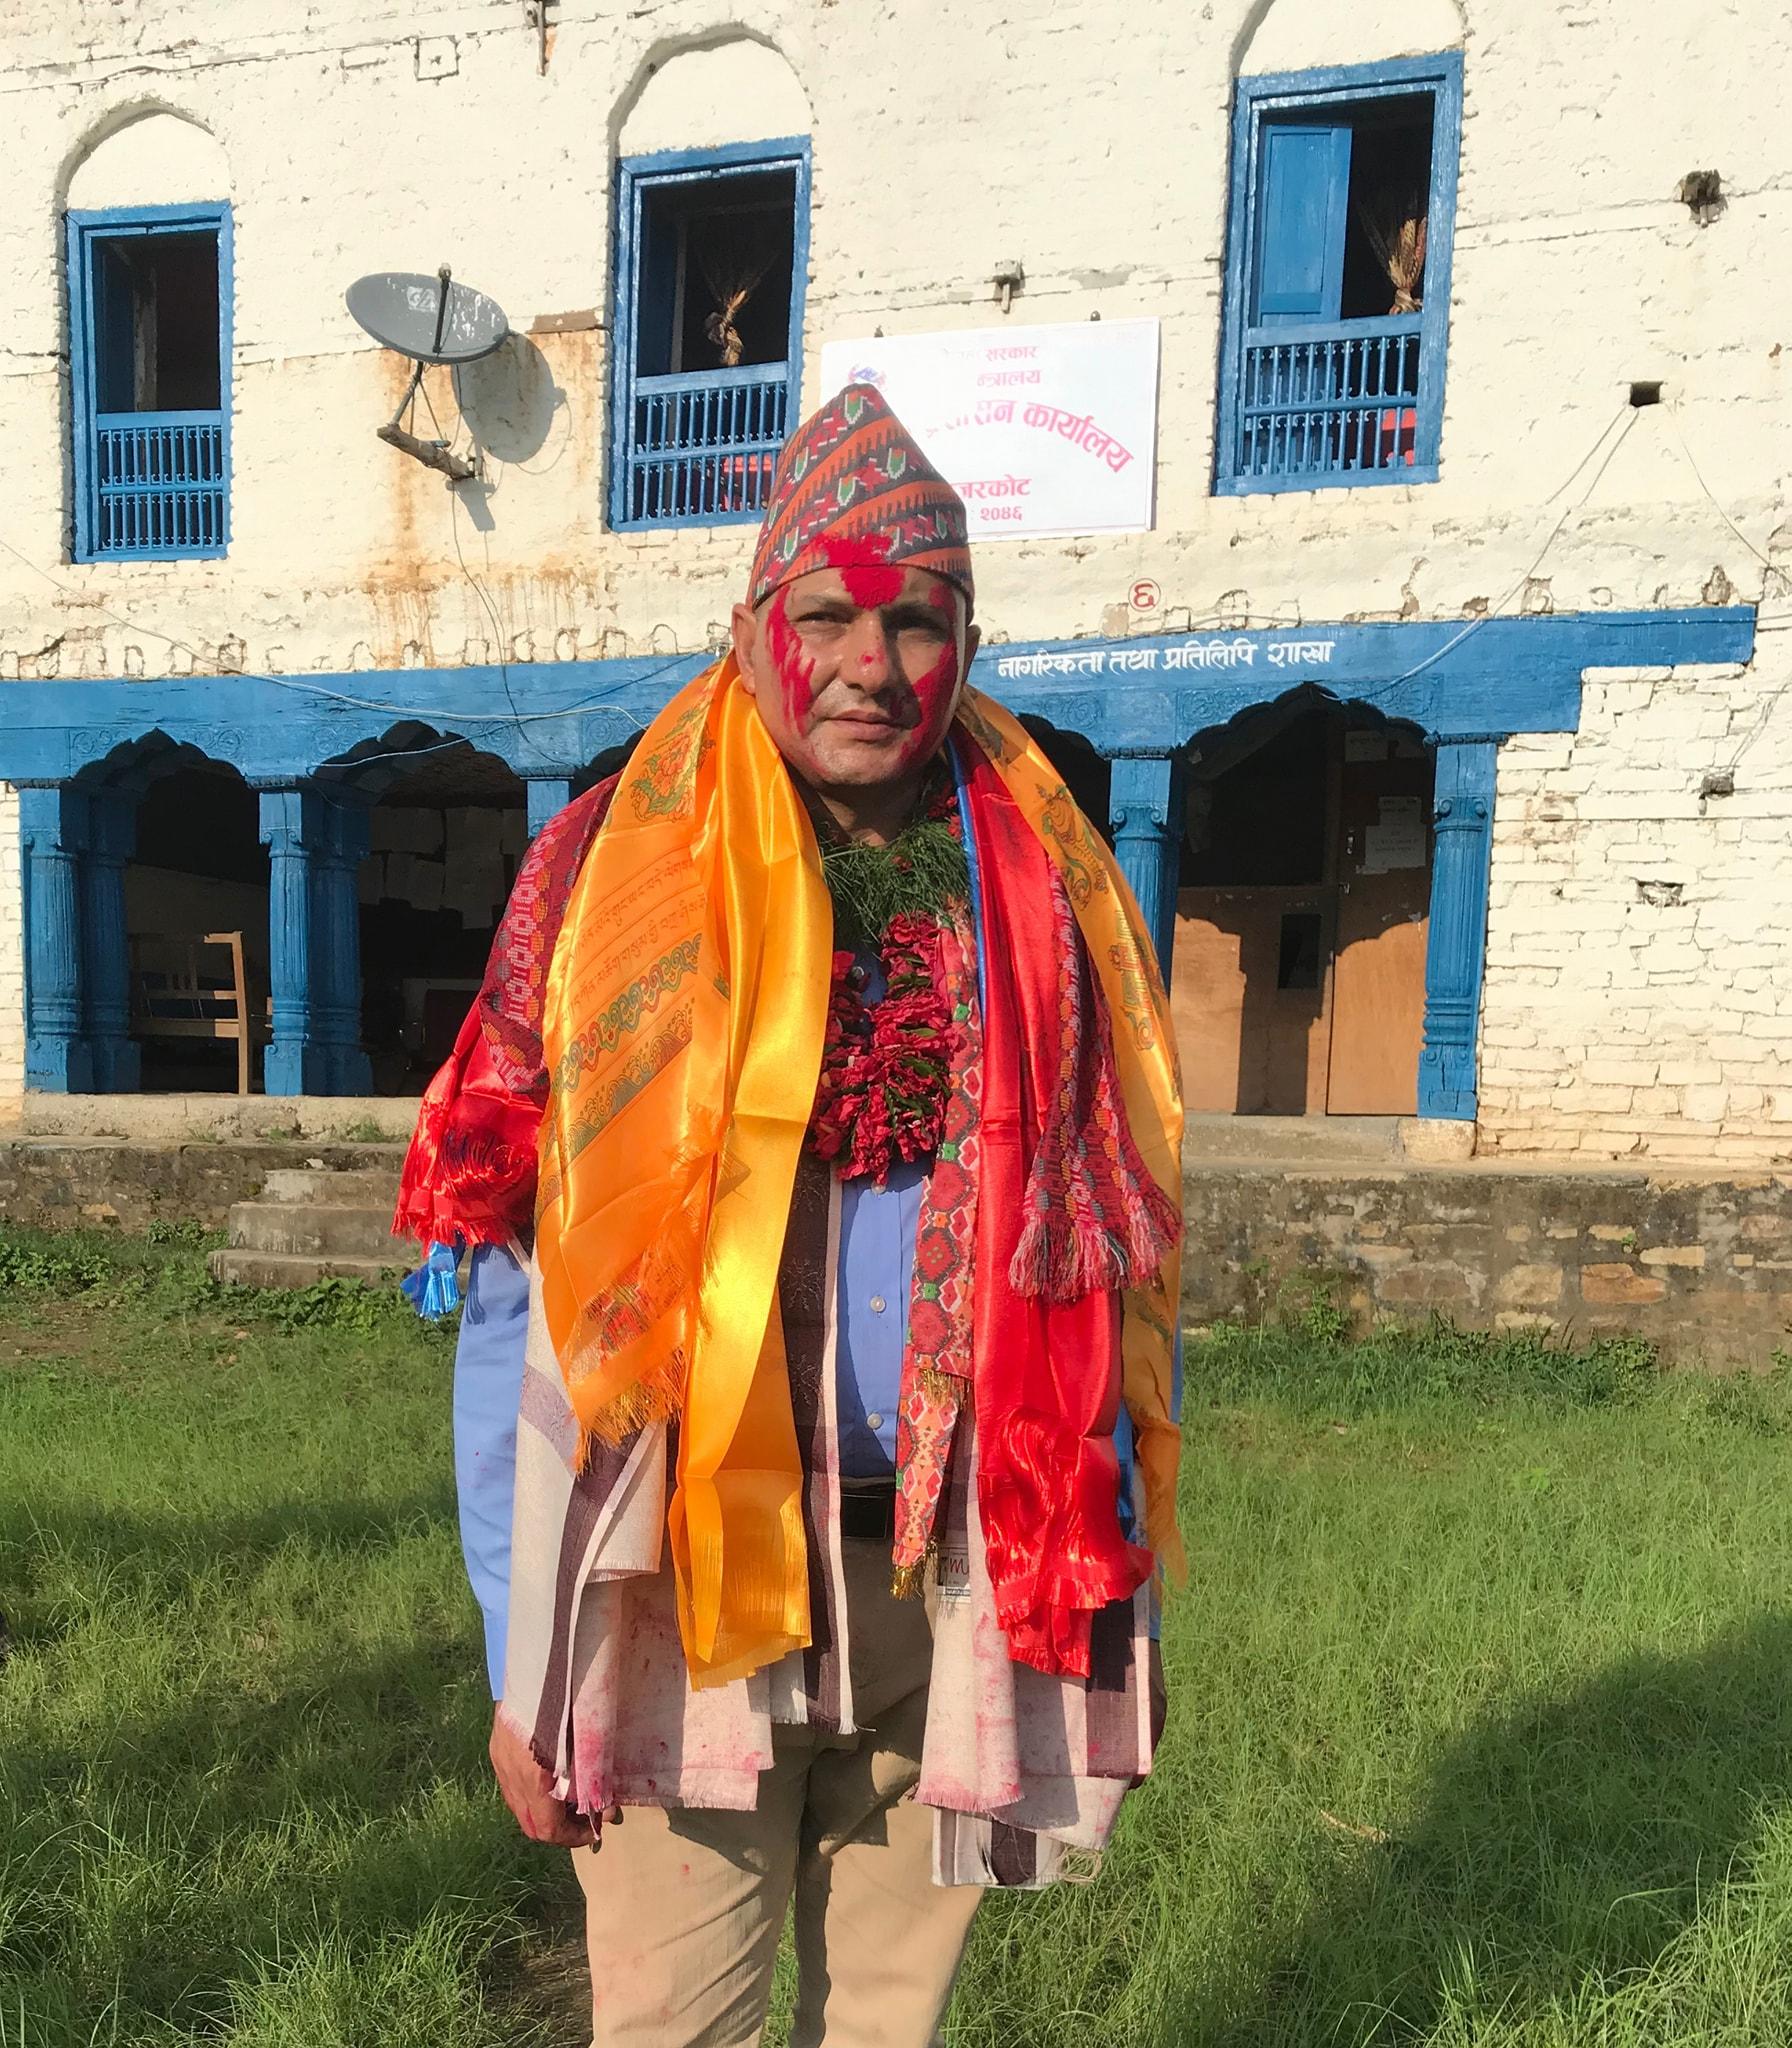 nepalkhabaronline